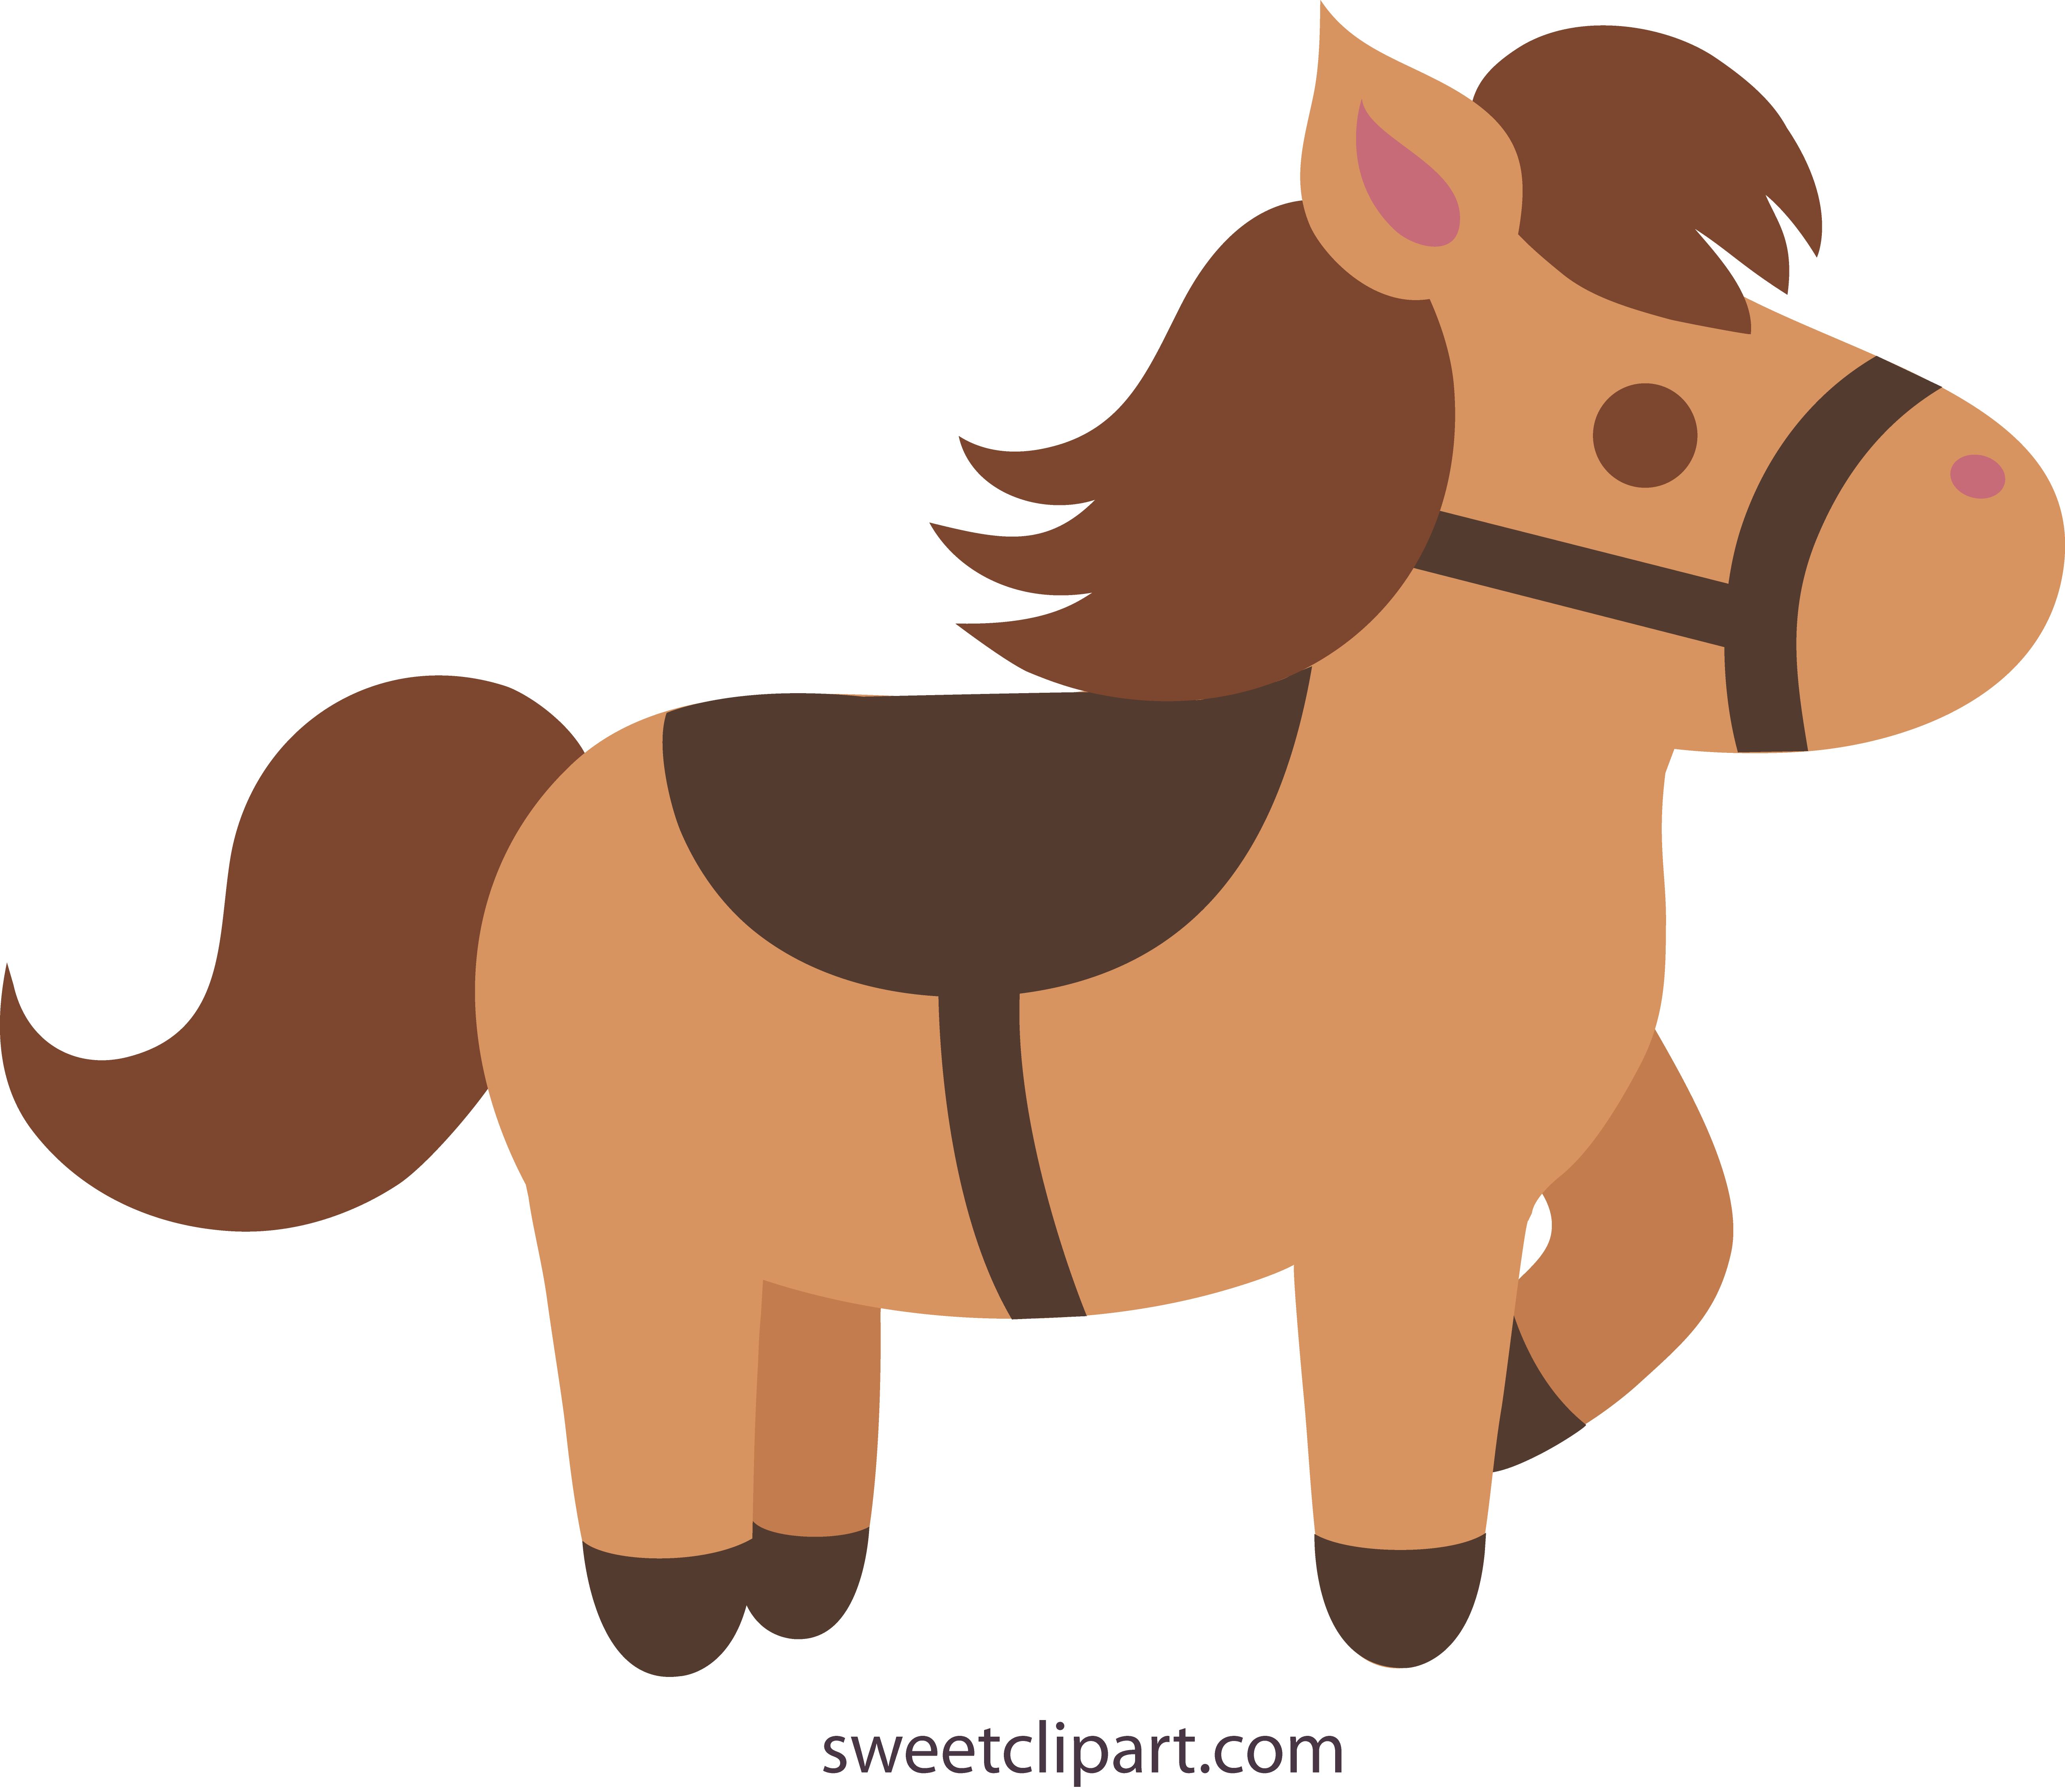 morgan horse clipart at getdrawings com free for personal use rh getdrawings com horse clipart romance horse clipart romance